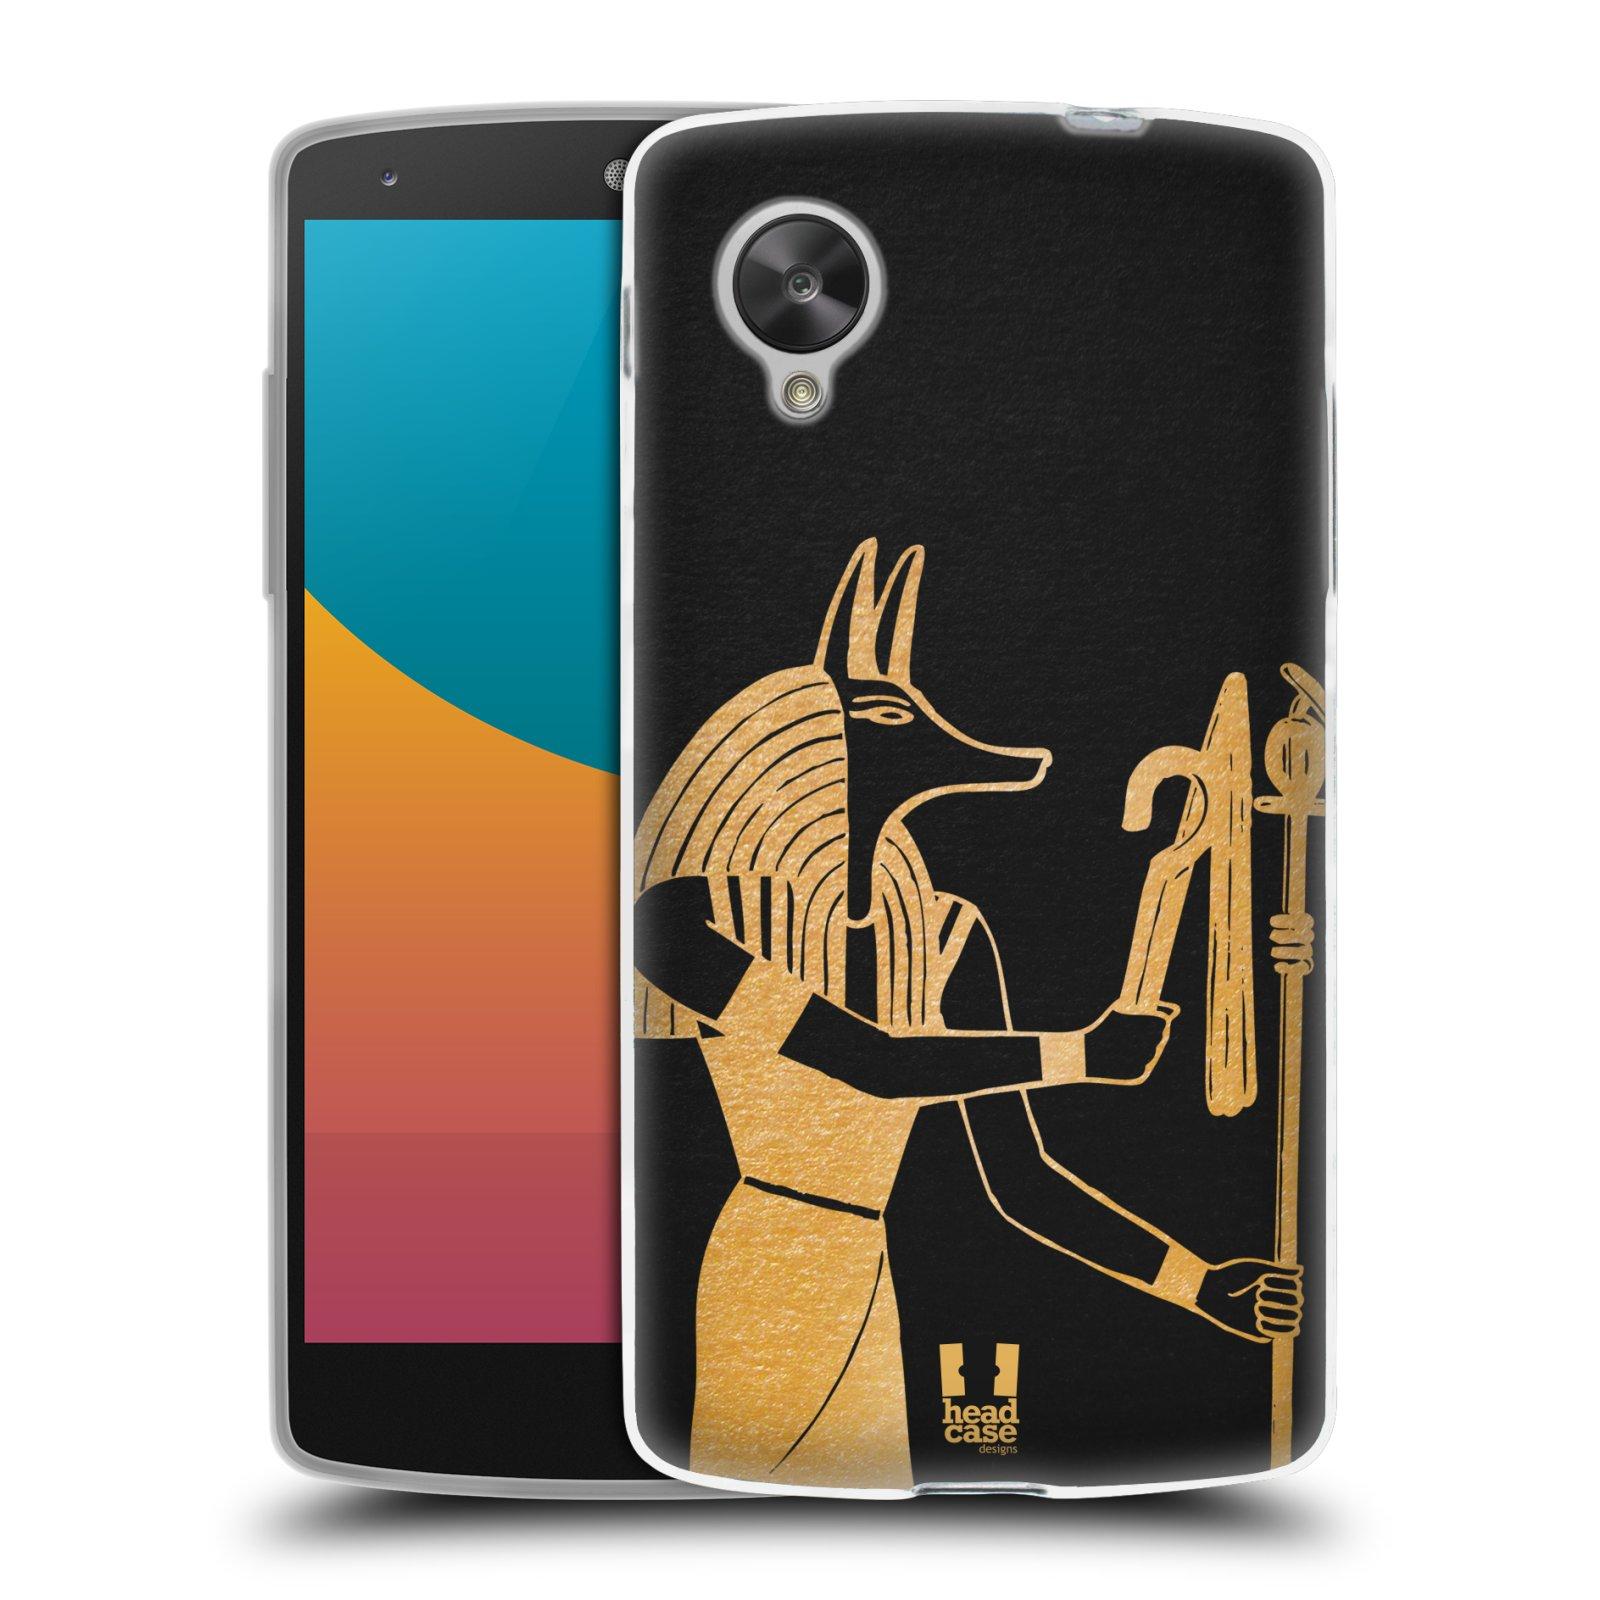 Silikonové pouzdro na mobil LG Nexus 5 HEAD CASE EGYPT ANUBIS (Silikonový kryt či obal na mobilní telefon LG Google Nexus 5 D821)